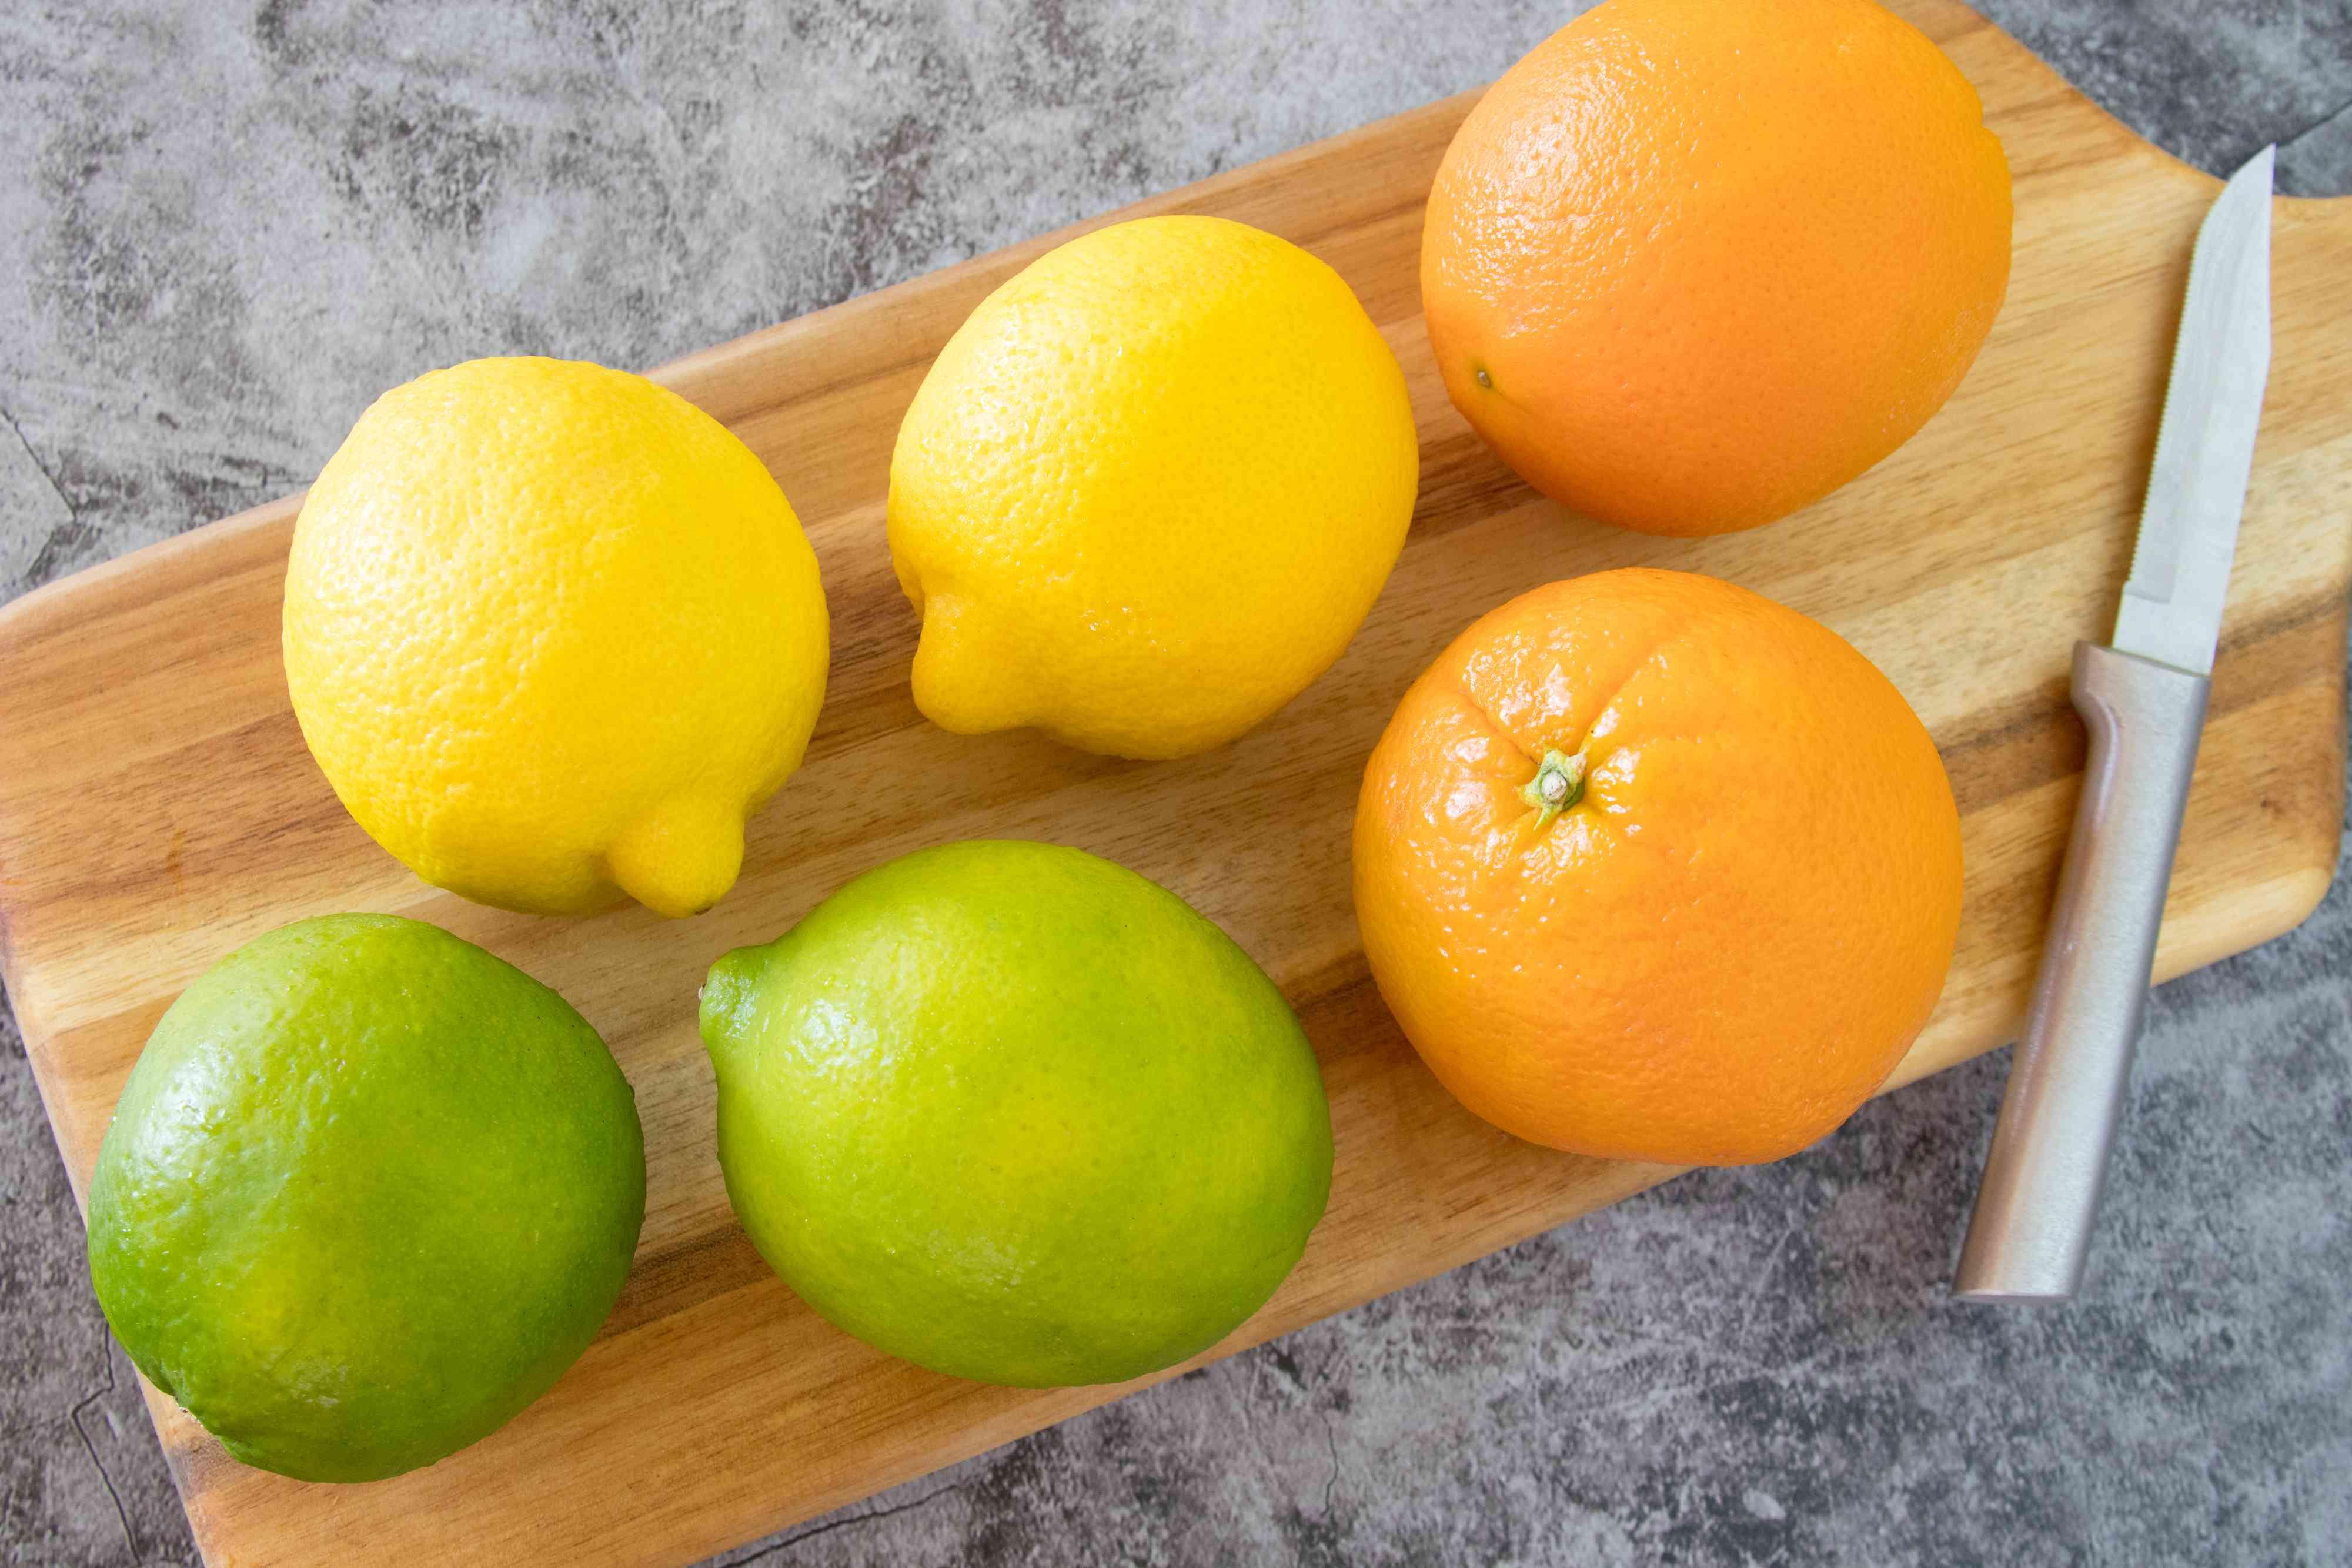 Select Beautiful Fruit for Garnishing Drinks